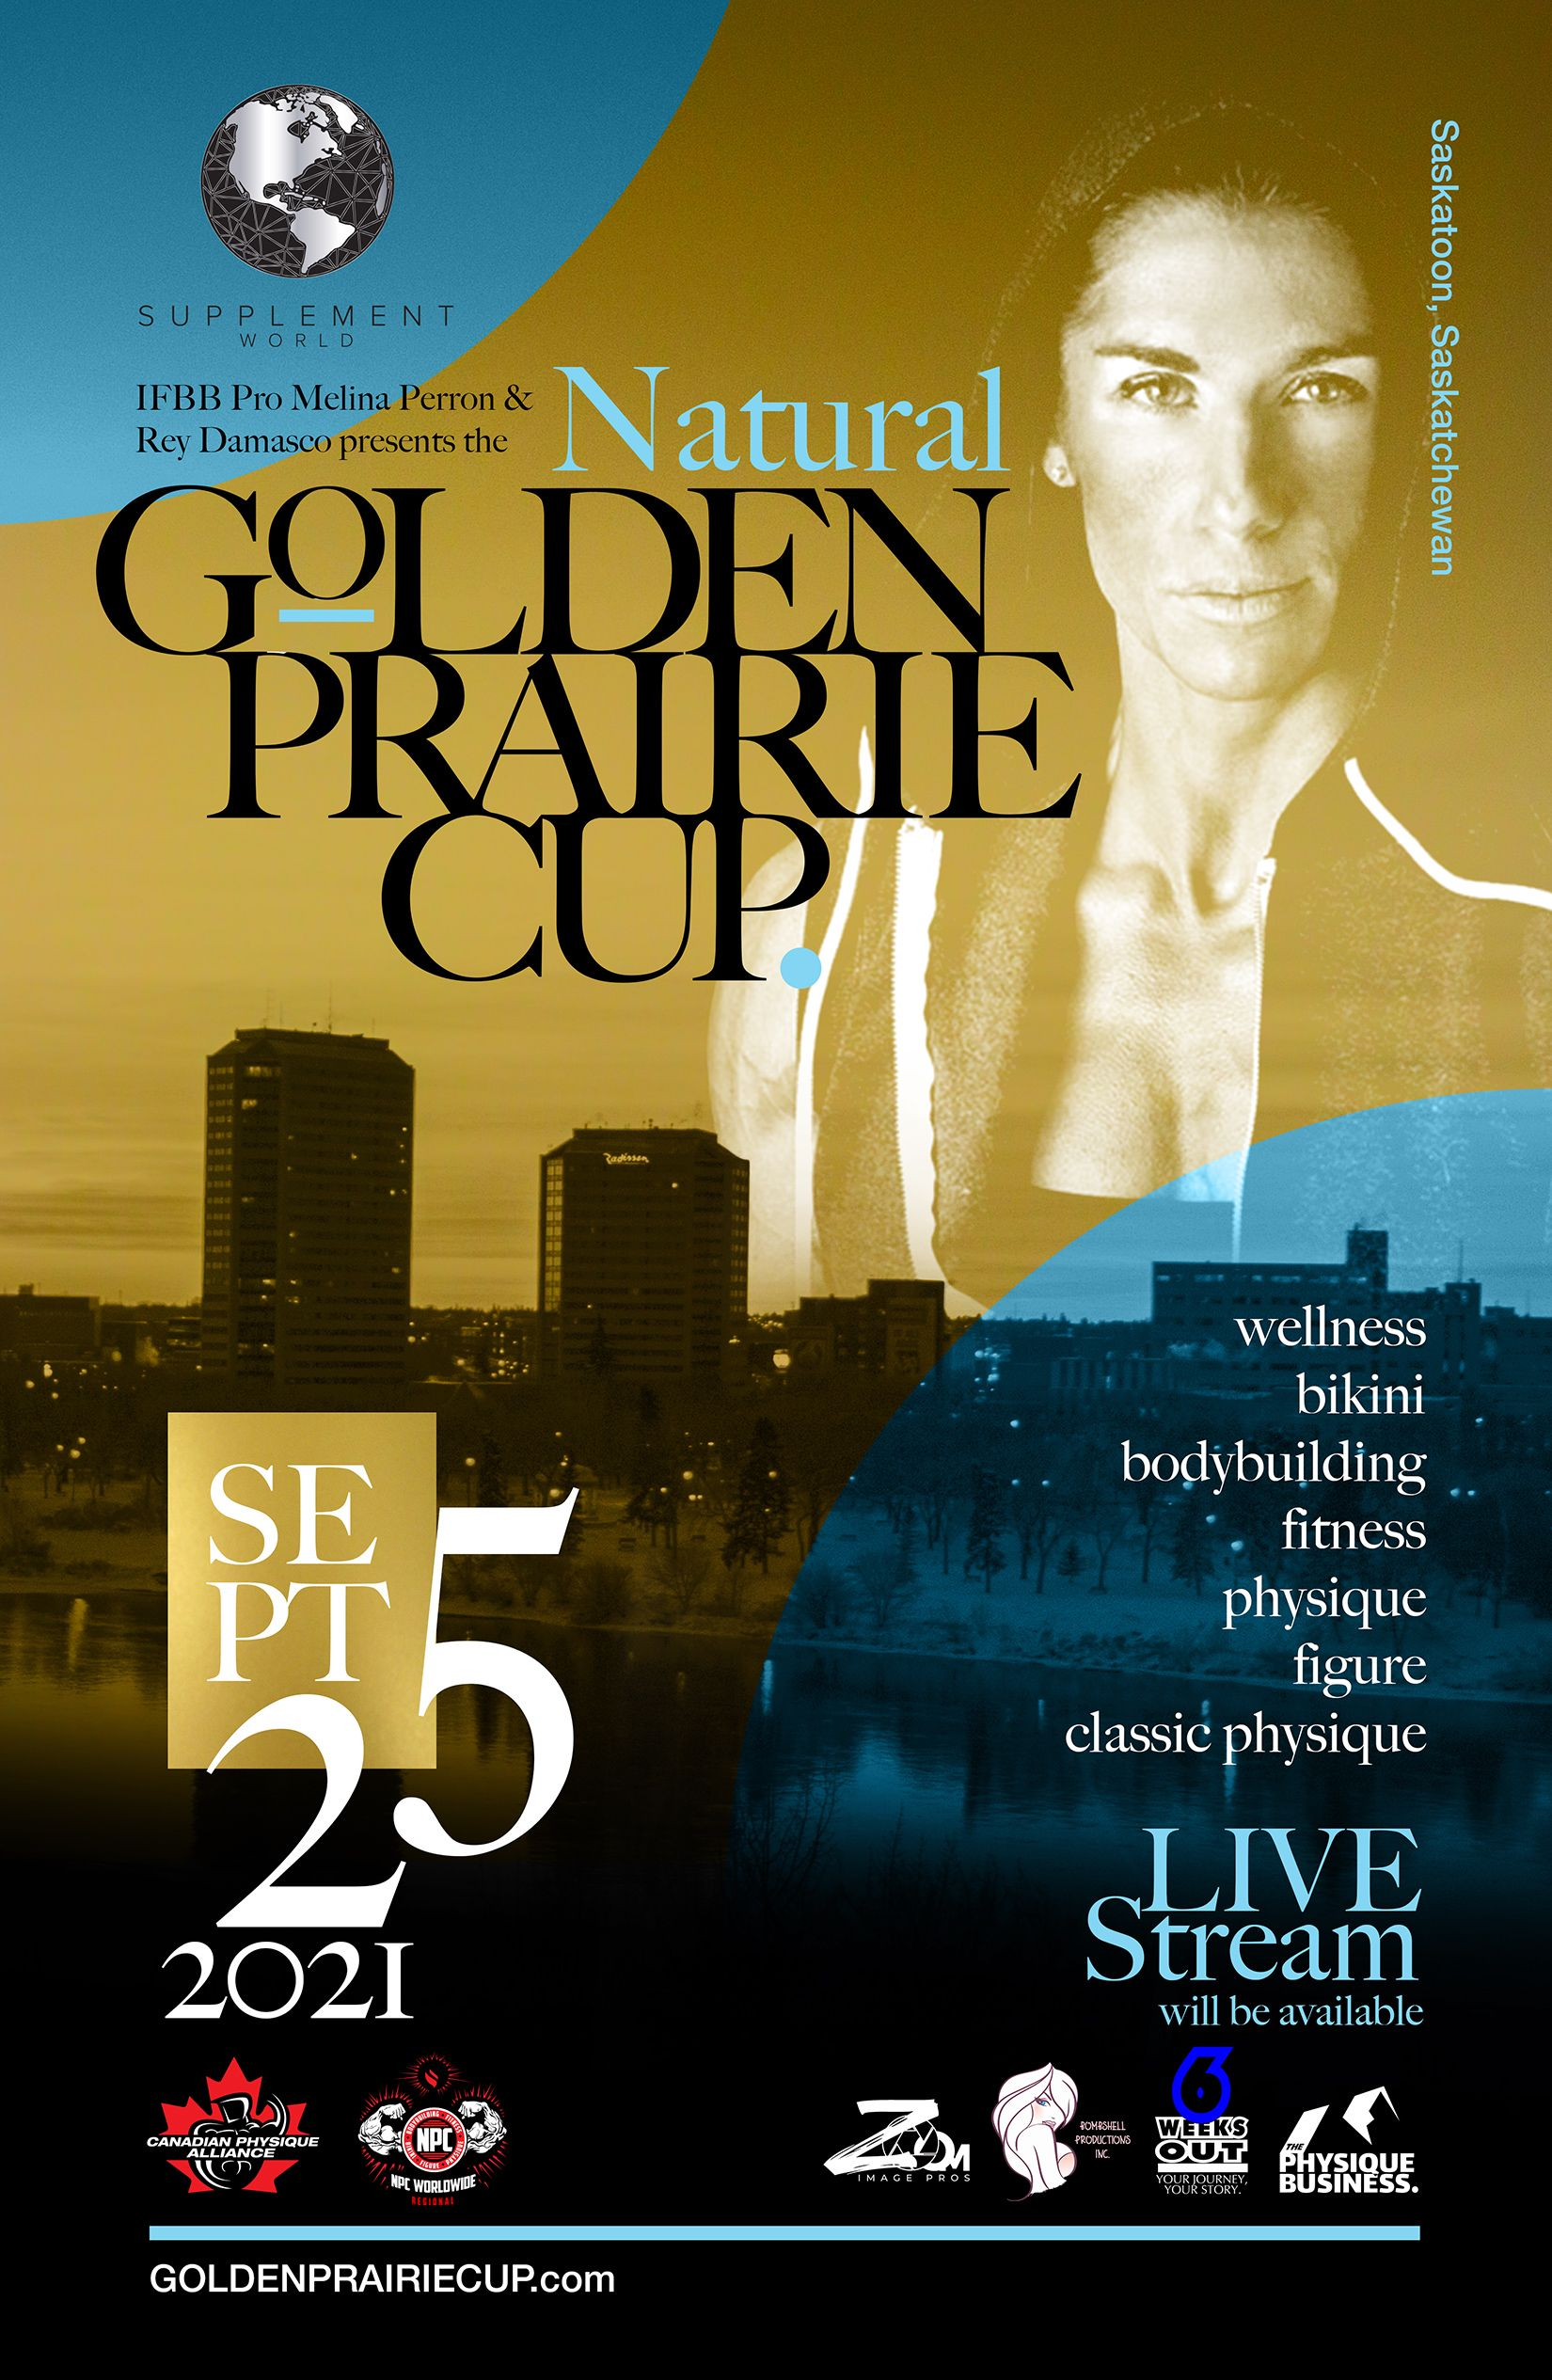 Golden Prairie Cup Poster